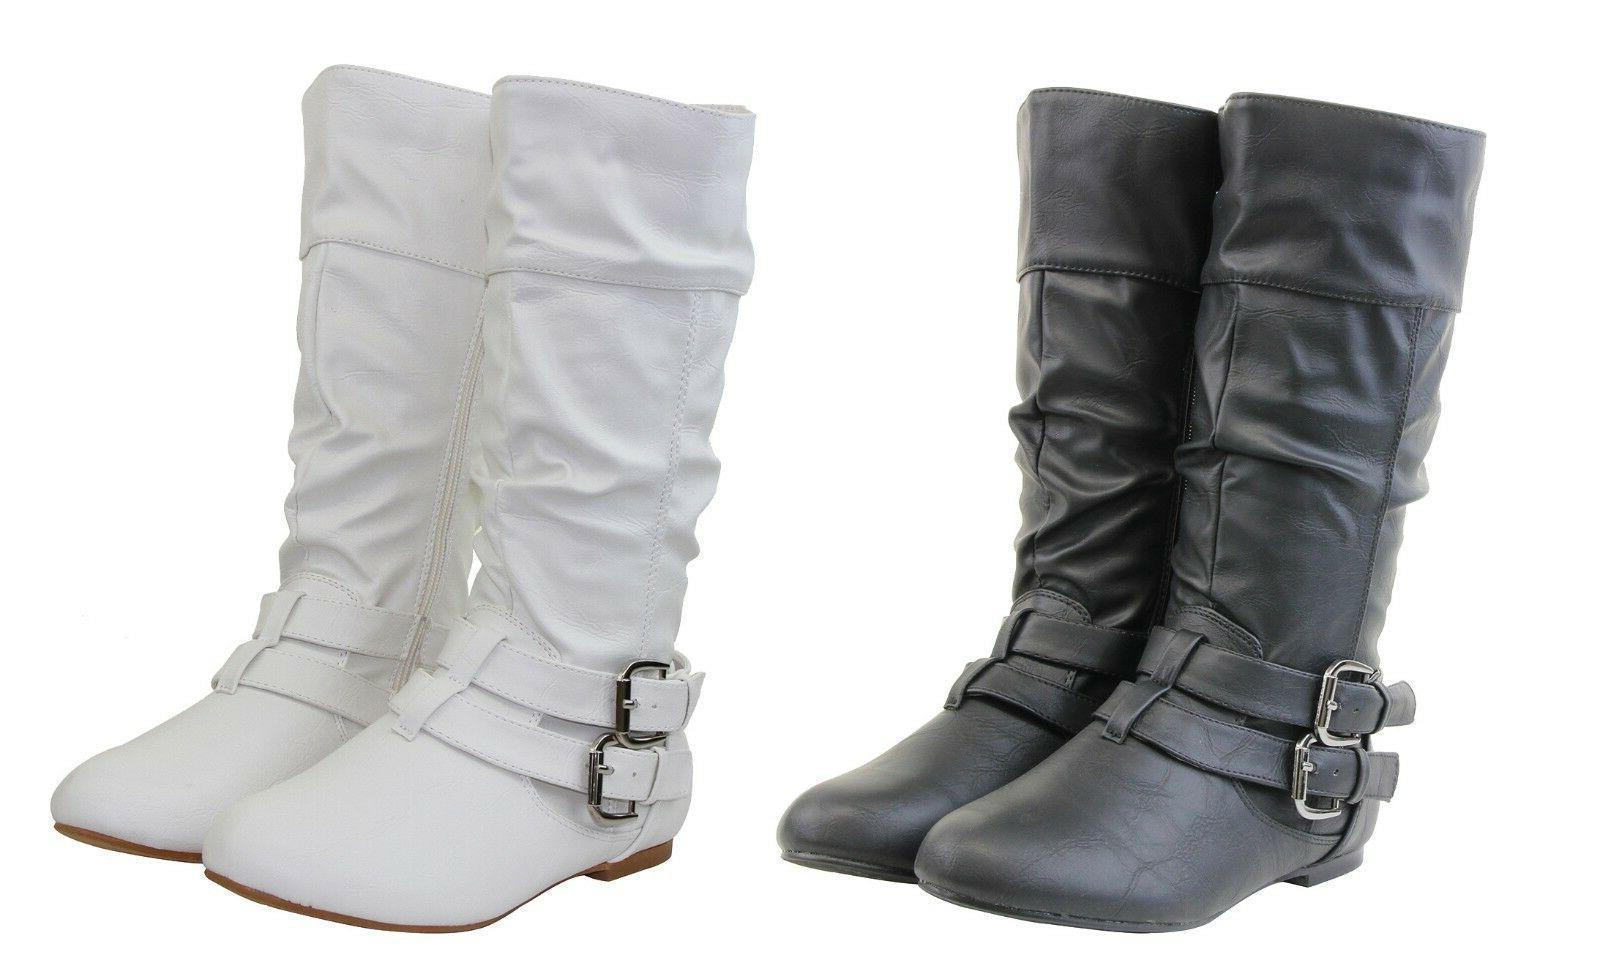 Sexy Women Riding Boots Mid Calf Causal Design Flat Heels Wi